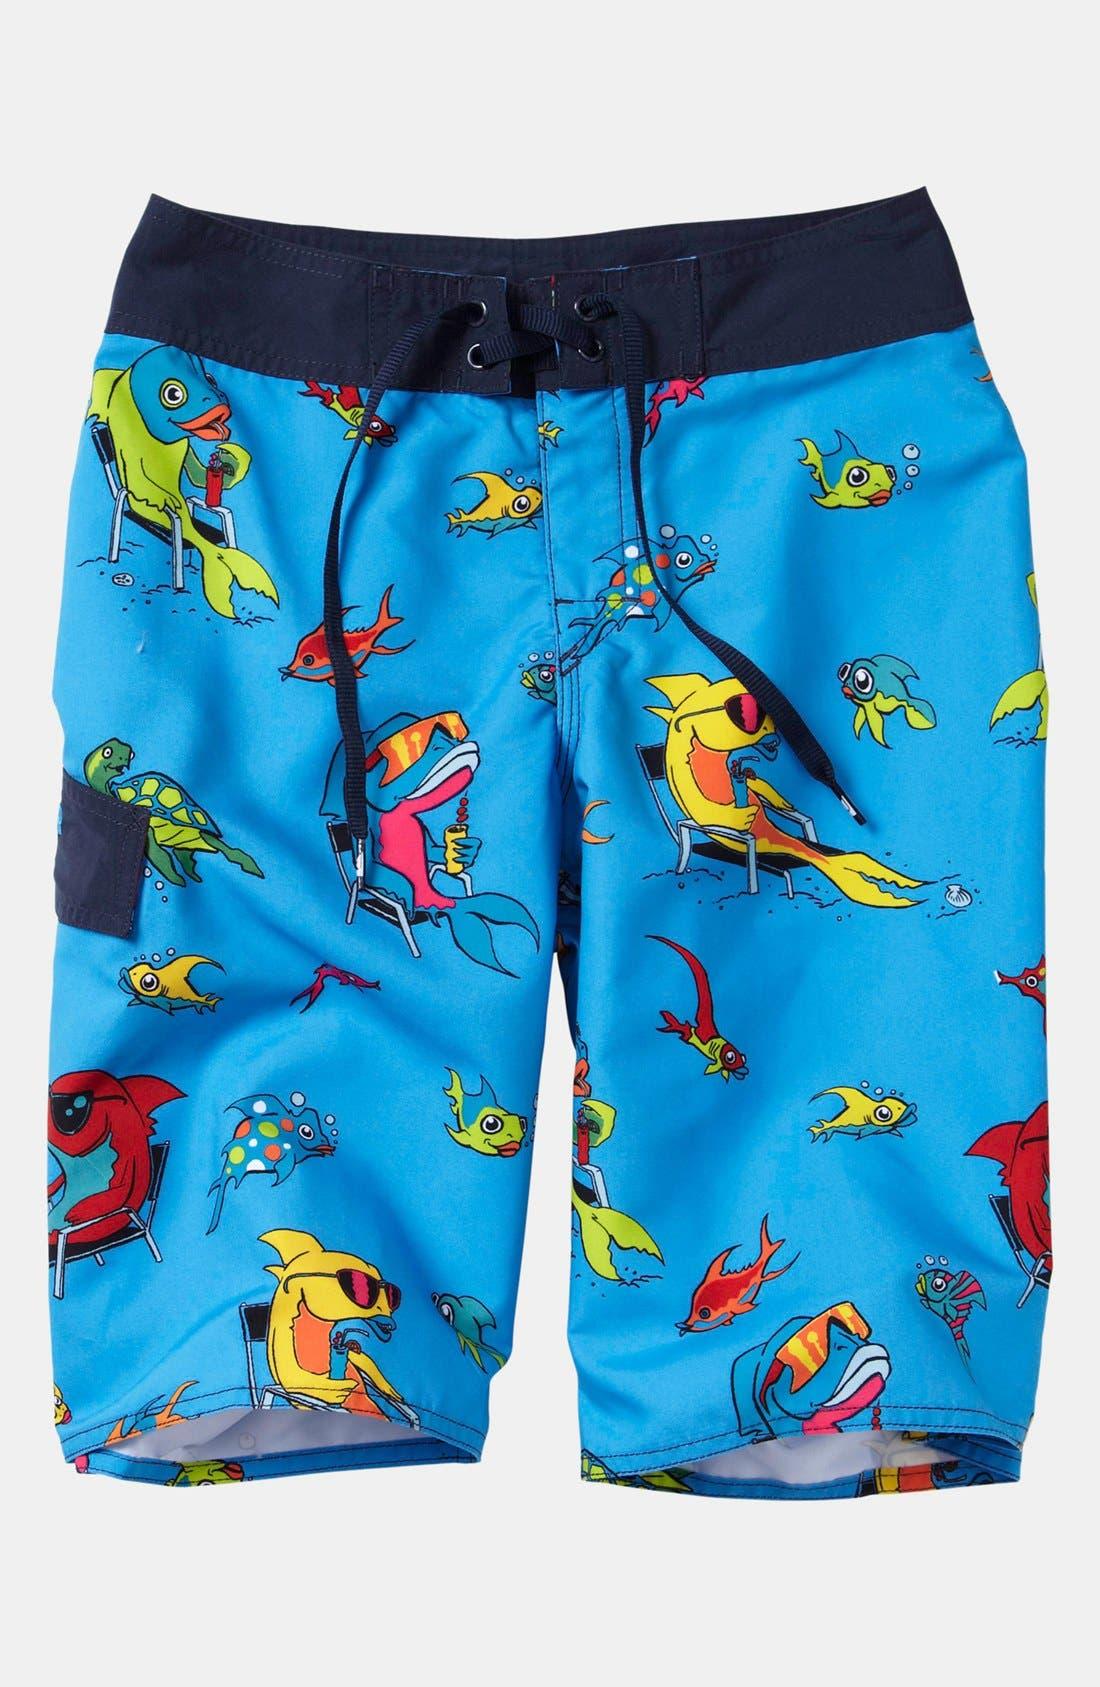 Main Image - Quiksilver 'Fish Tacoz' Board Shorts (Big Boys)